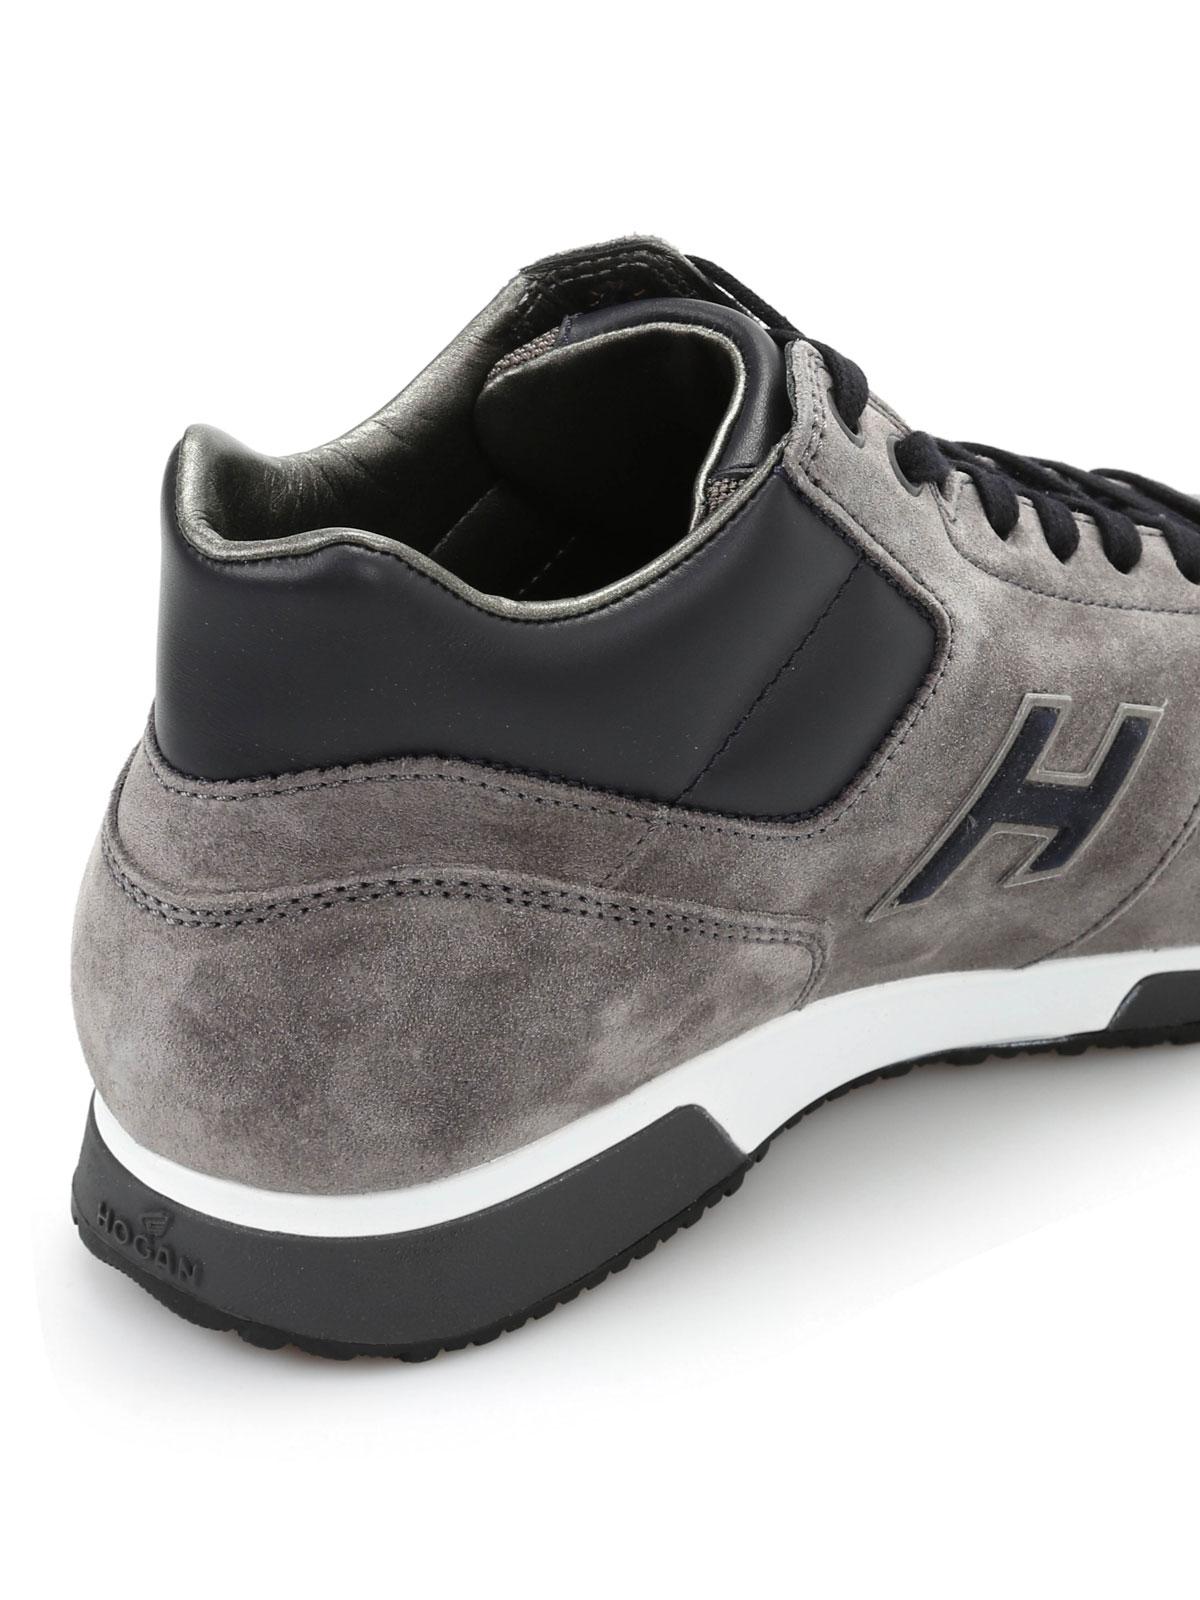 Trainers Hogan - H198 mid cut sneakers - HXM1980O430E5G4190 ...